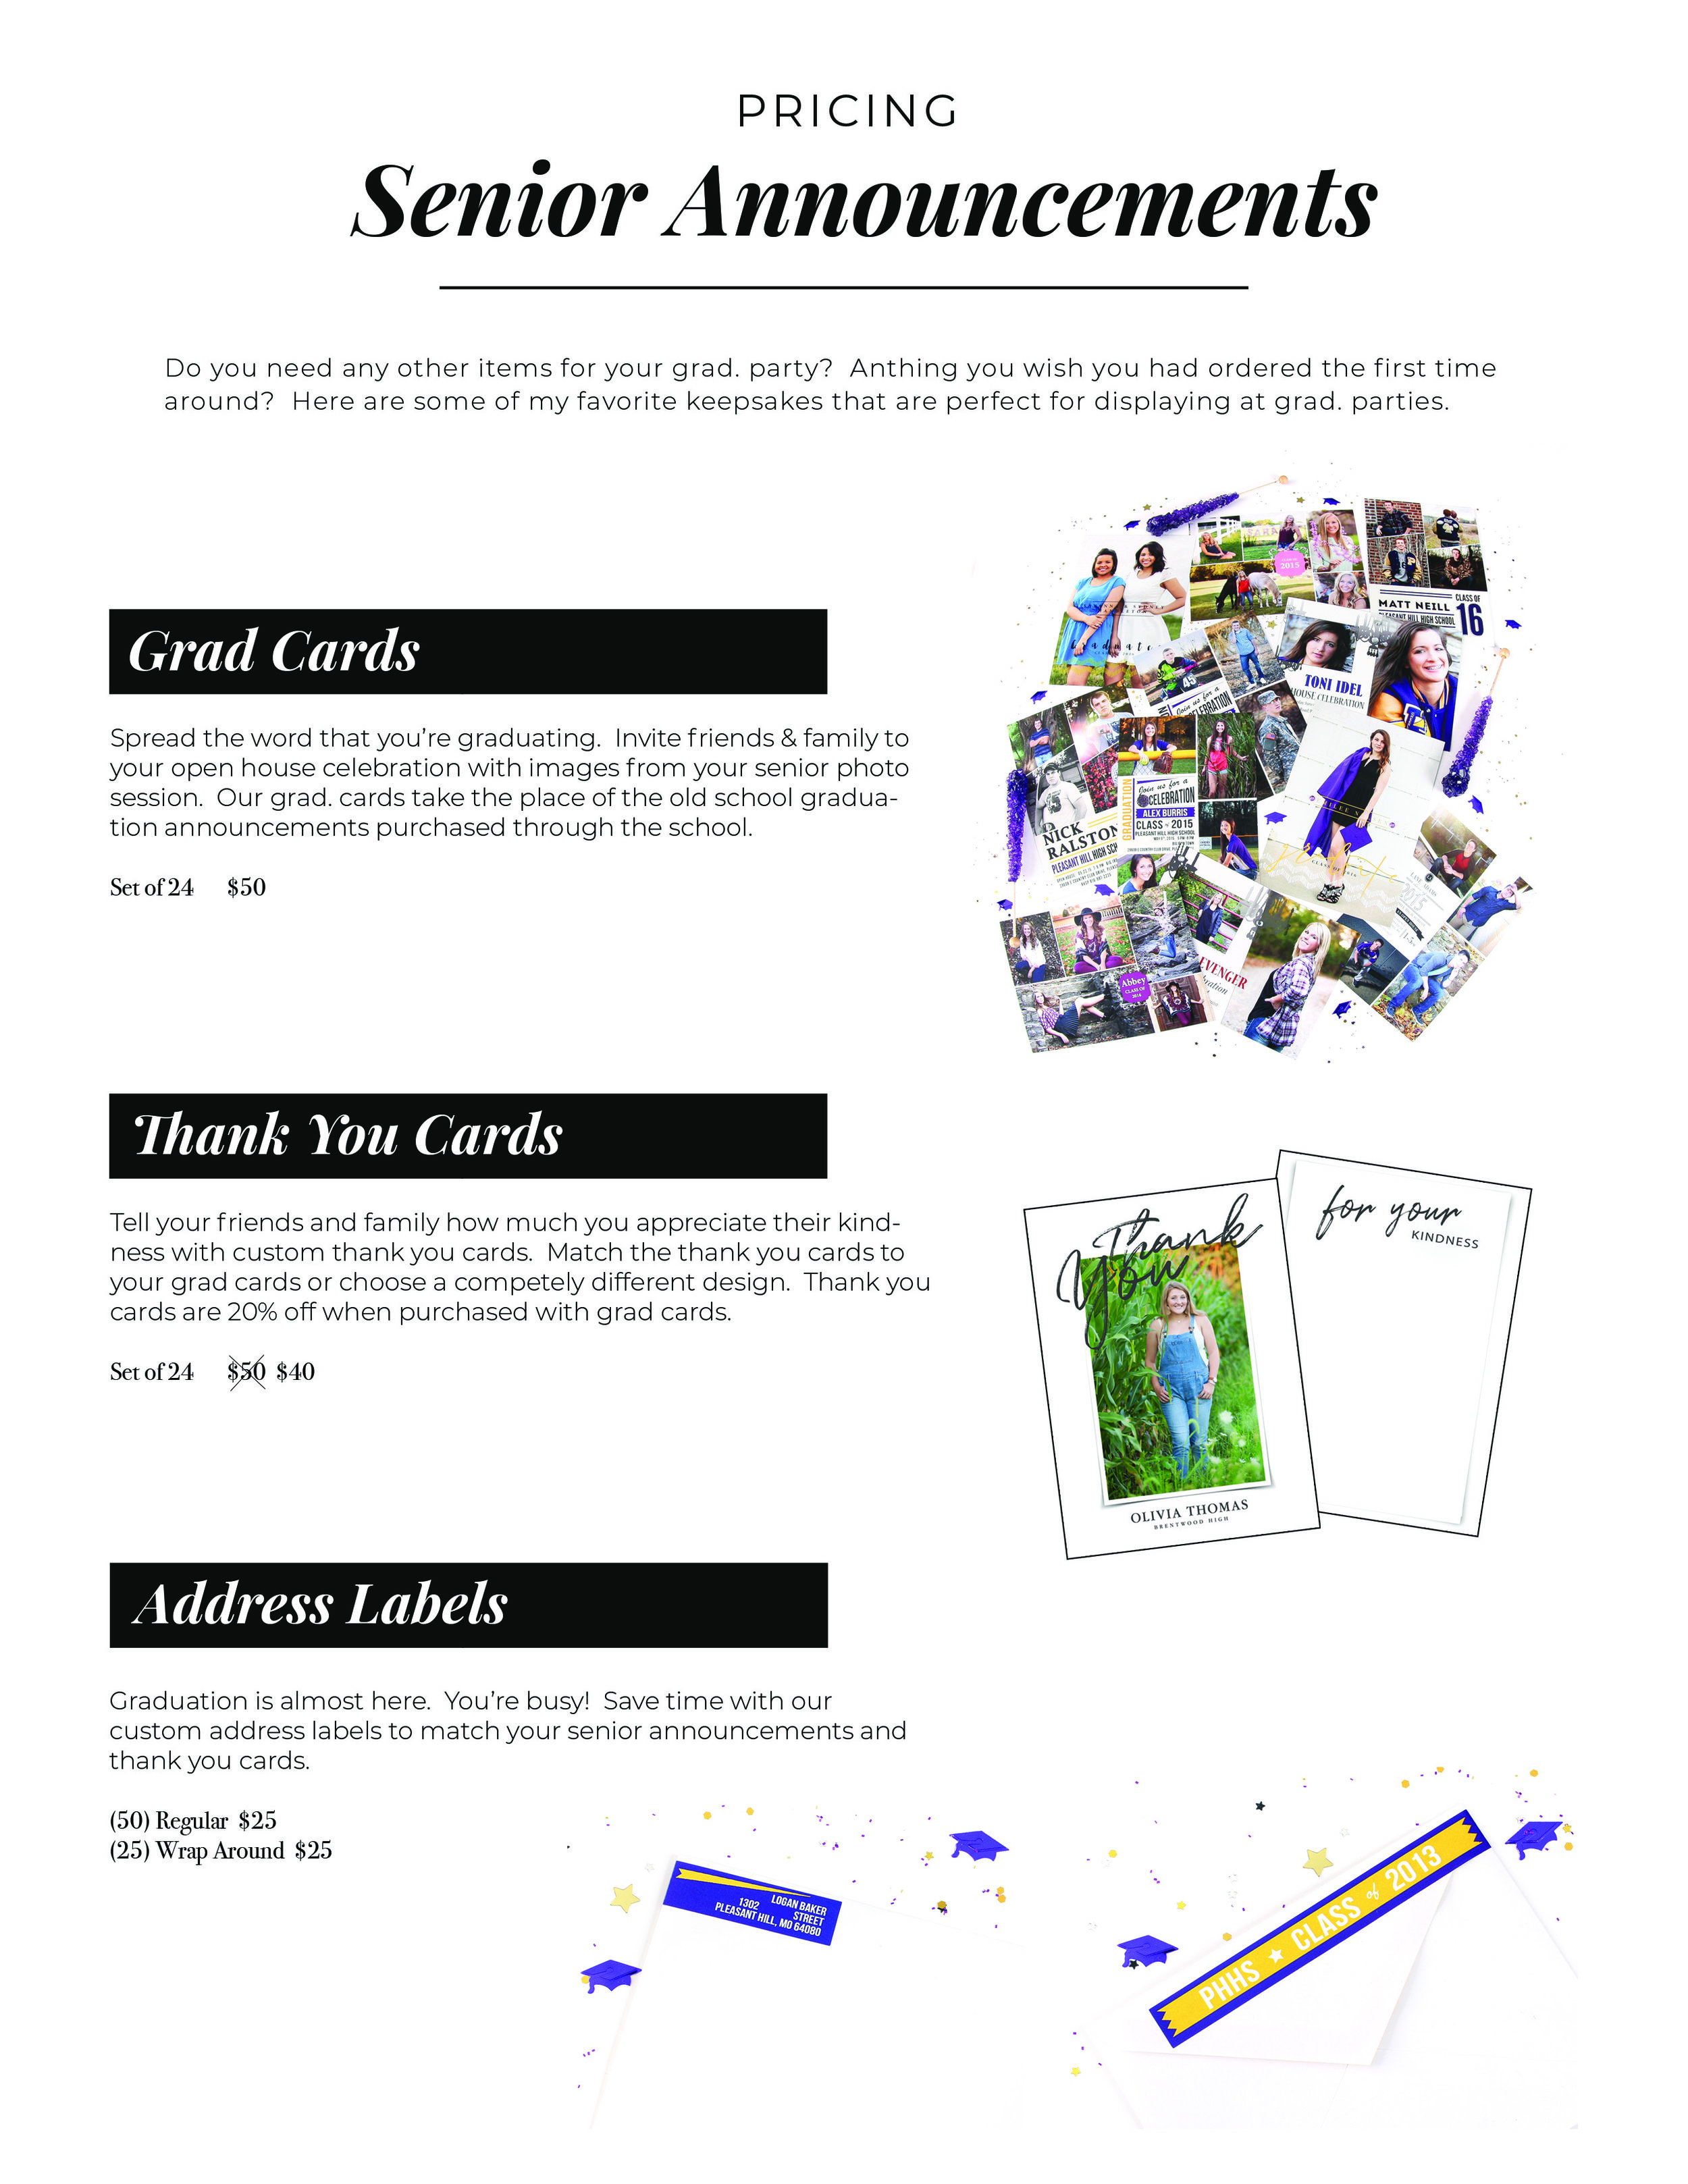 05 - Gradalogue-CardPricing.jpg